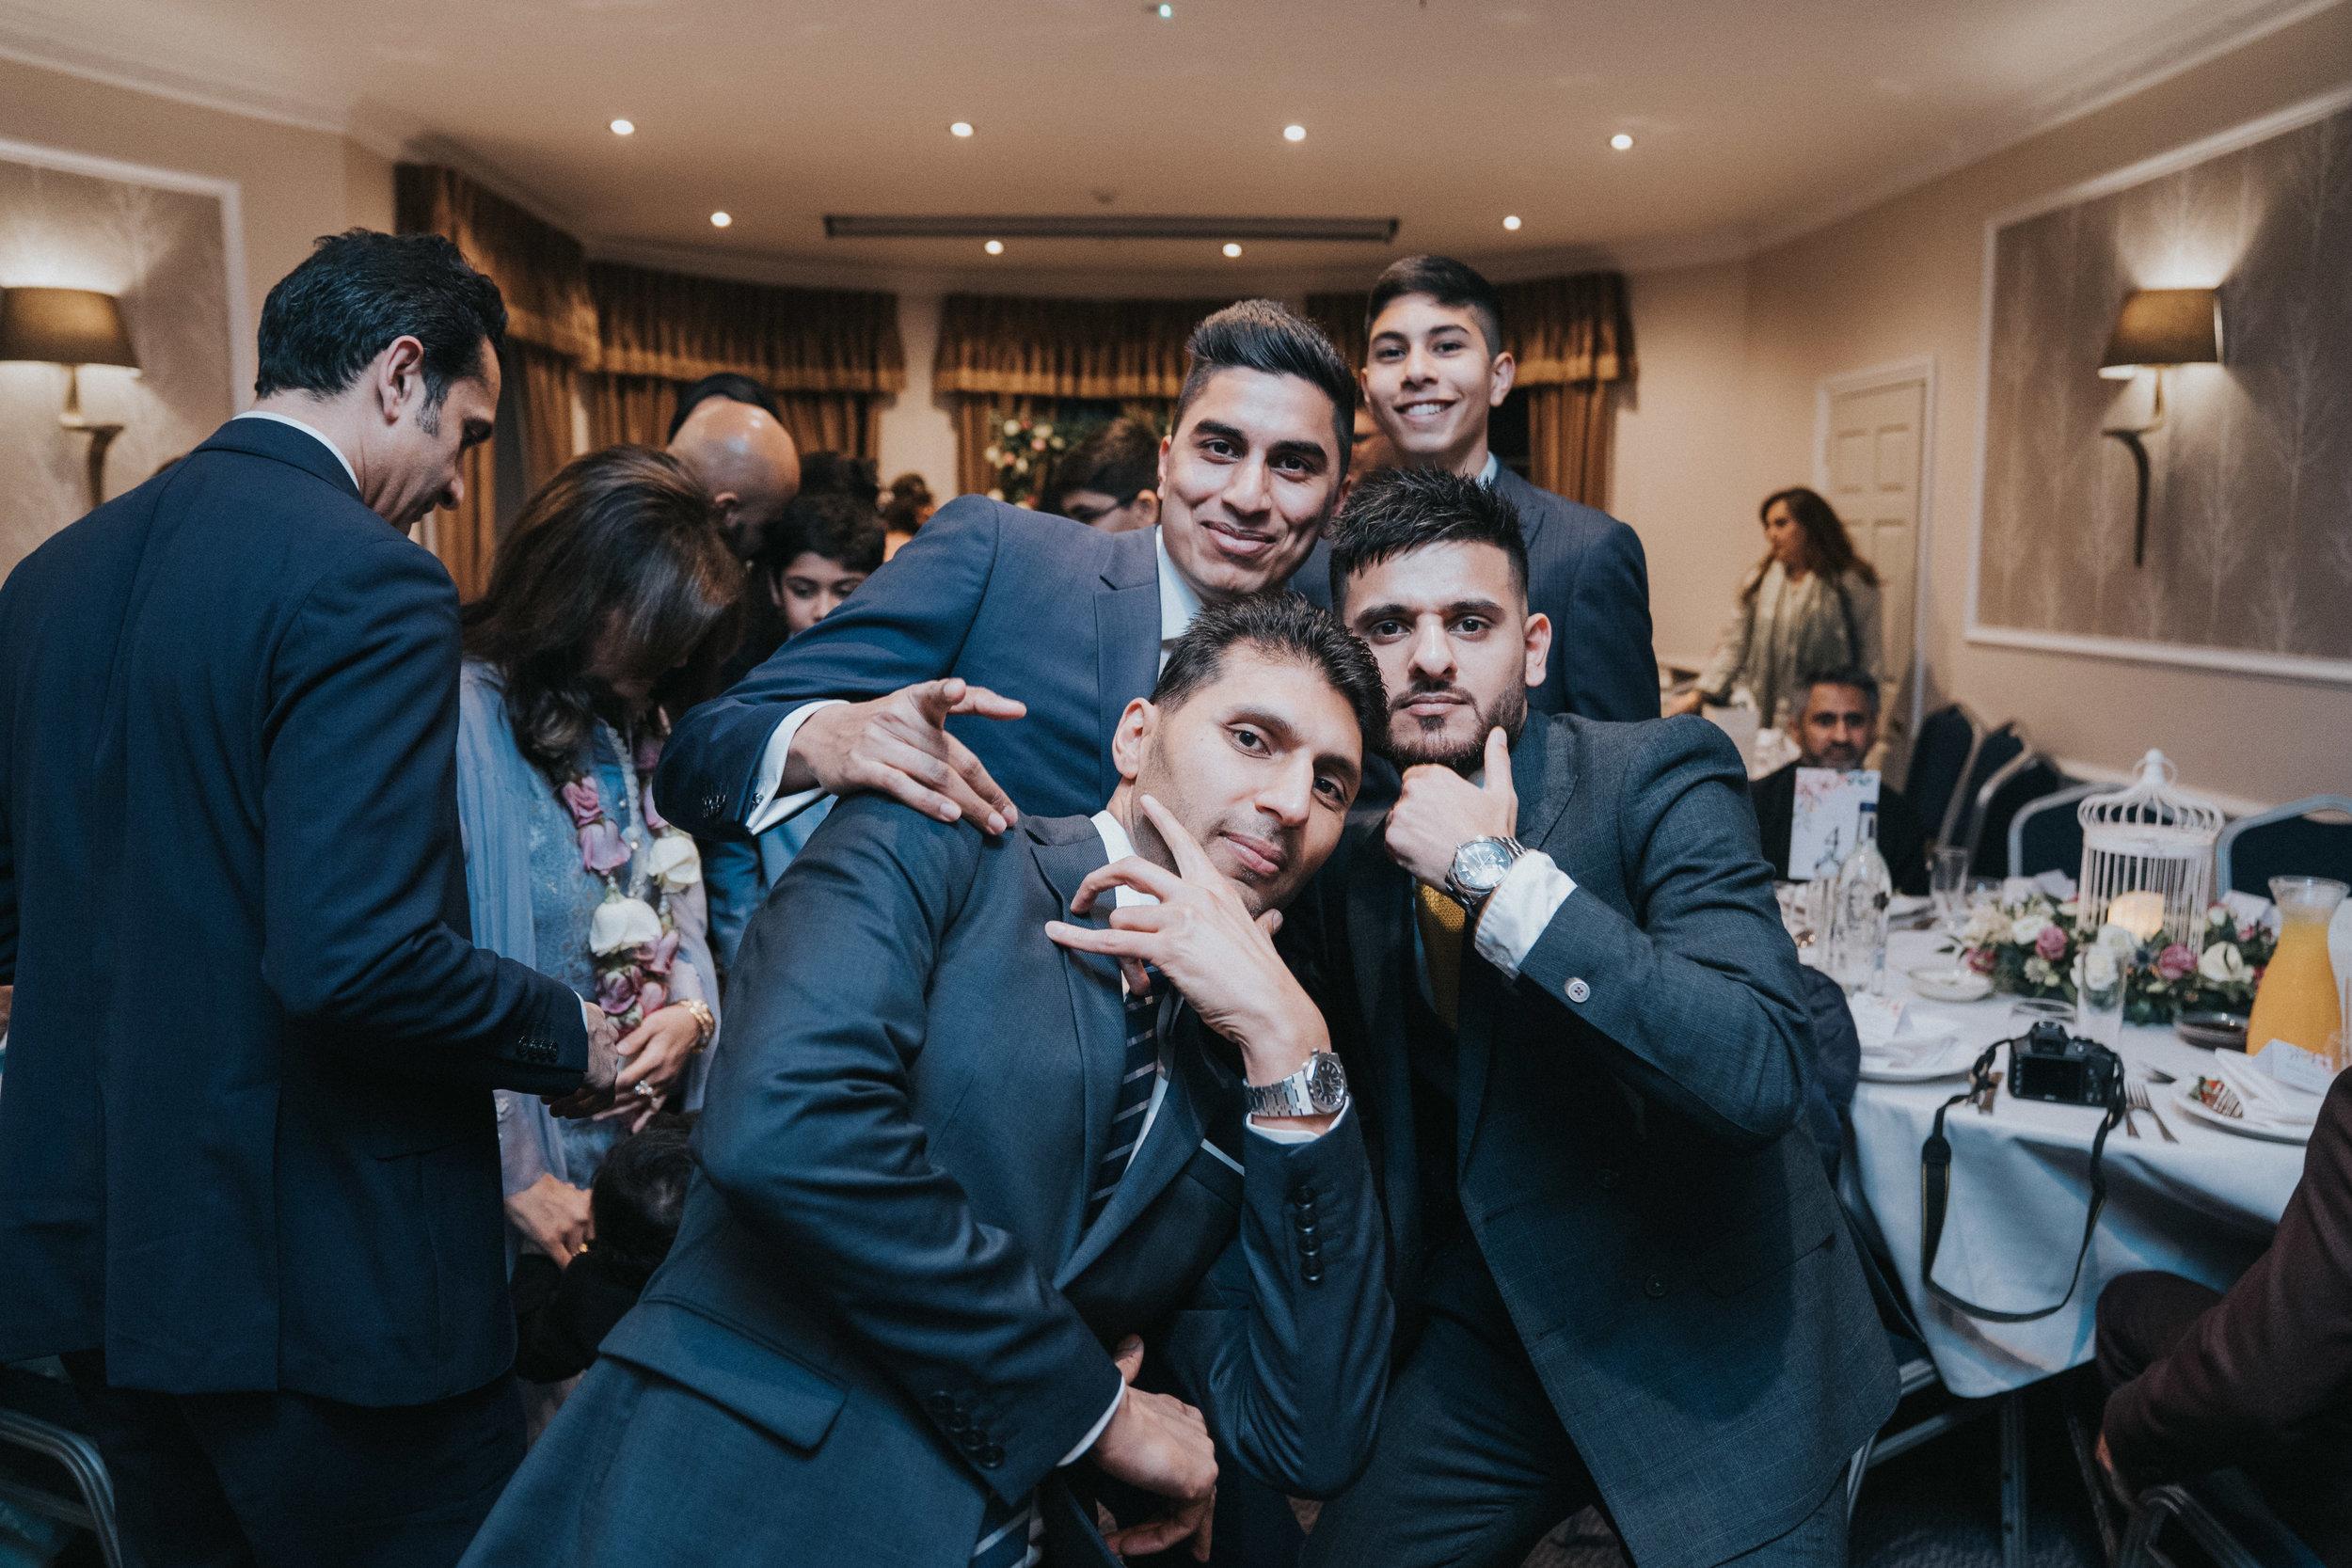 buckinghamshire-golf-club-winter-muslim-wedding-engagement-photography-videography-115